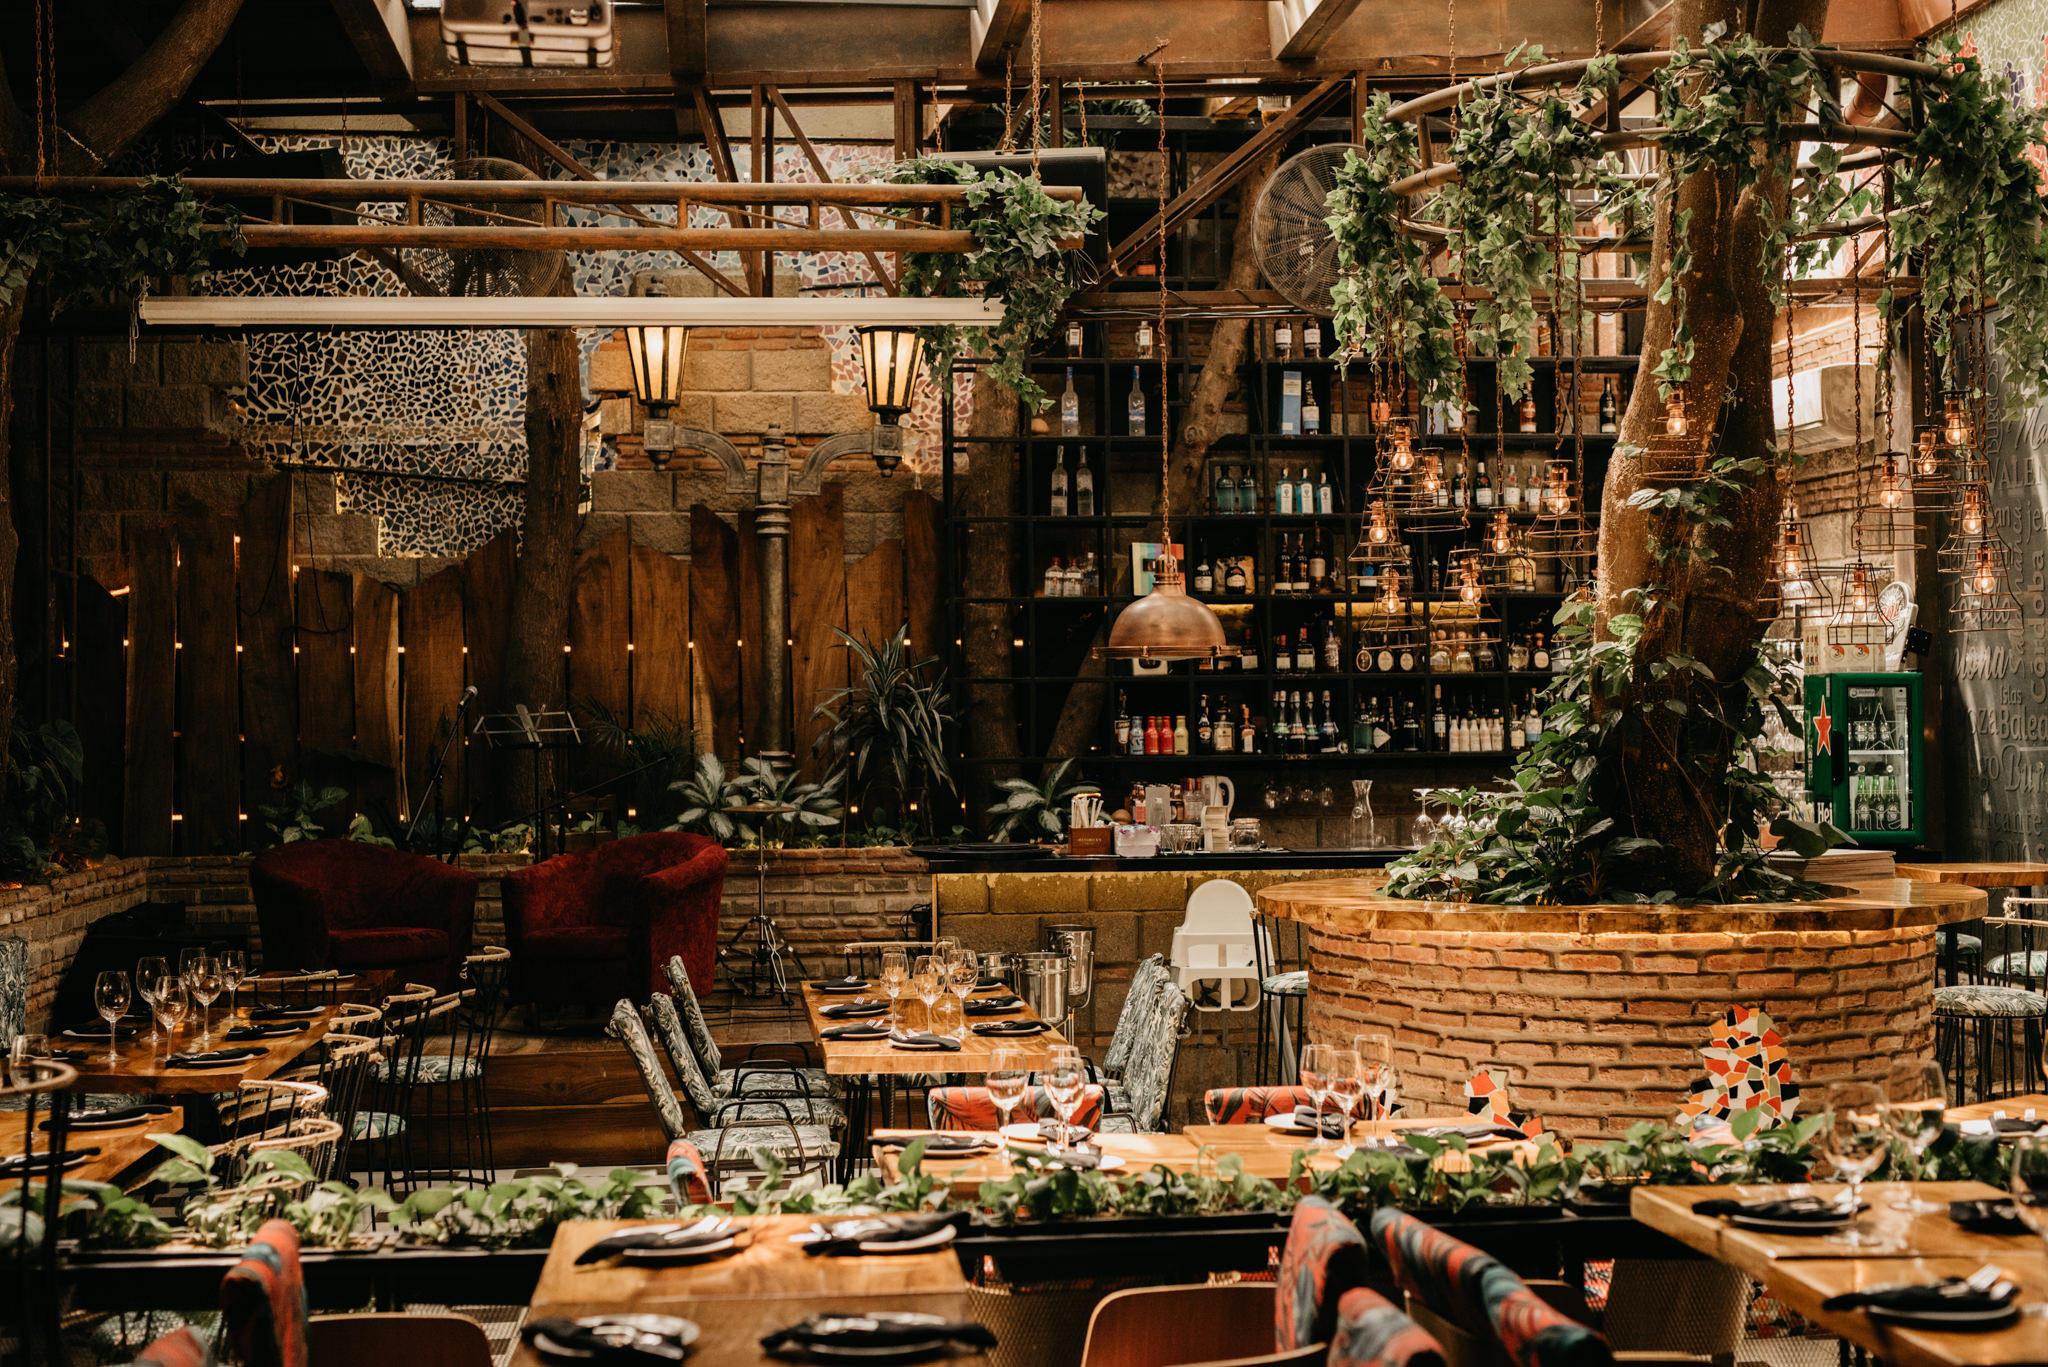 restaurante-sabina-restaurantes-barranquilla-fotografia-arquitec